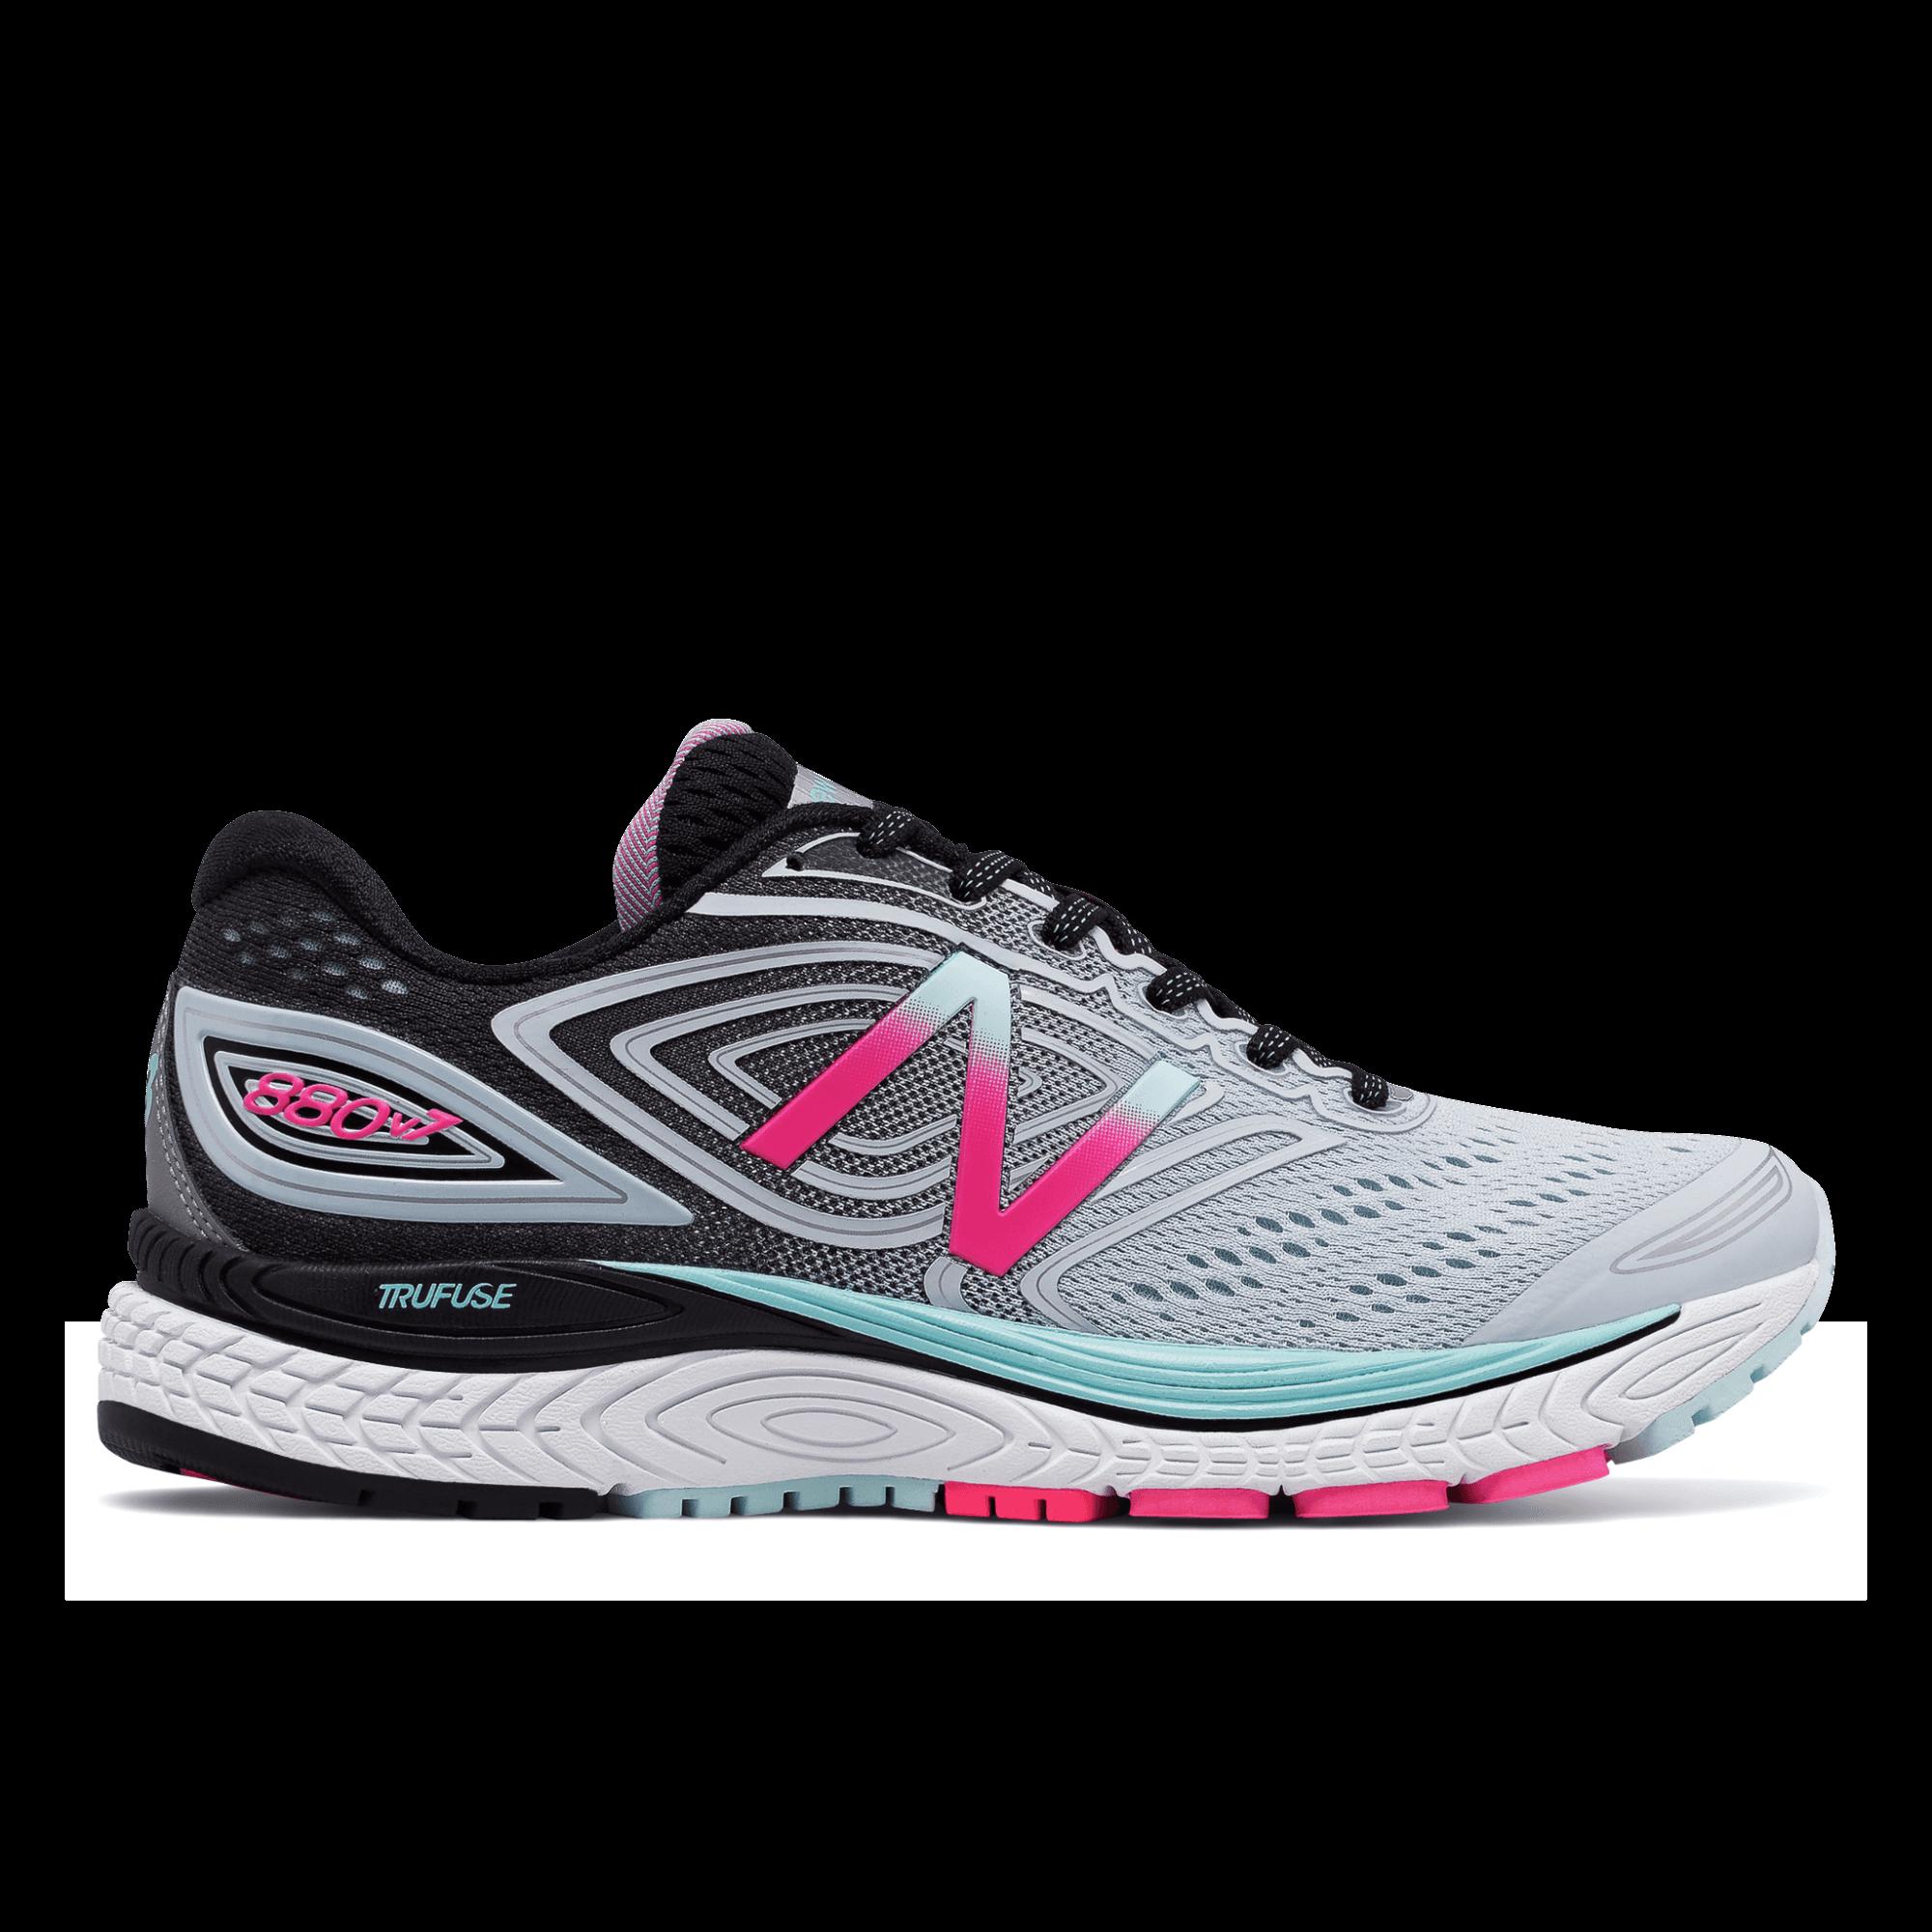 Competir jugo Vago  New Balance Women's 880v8 Running Shoe | BMC Sports